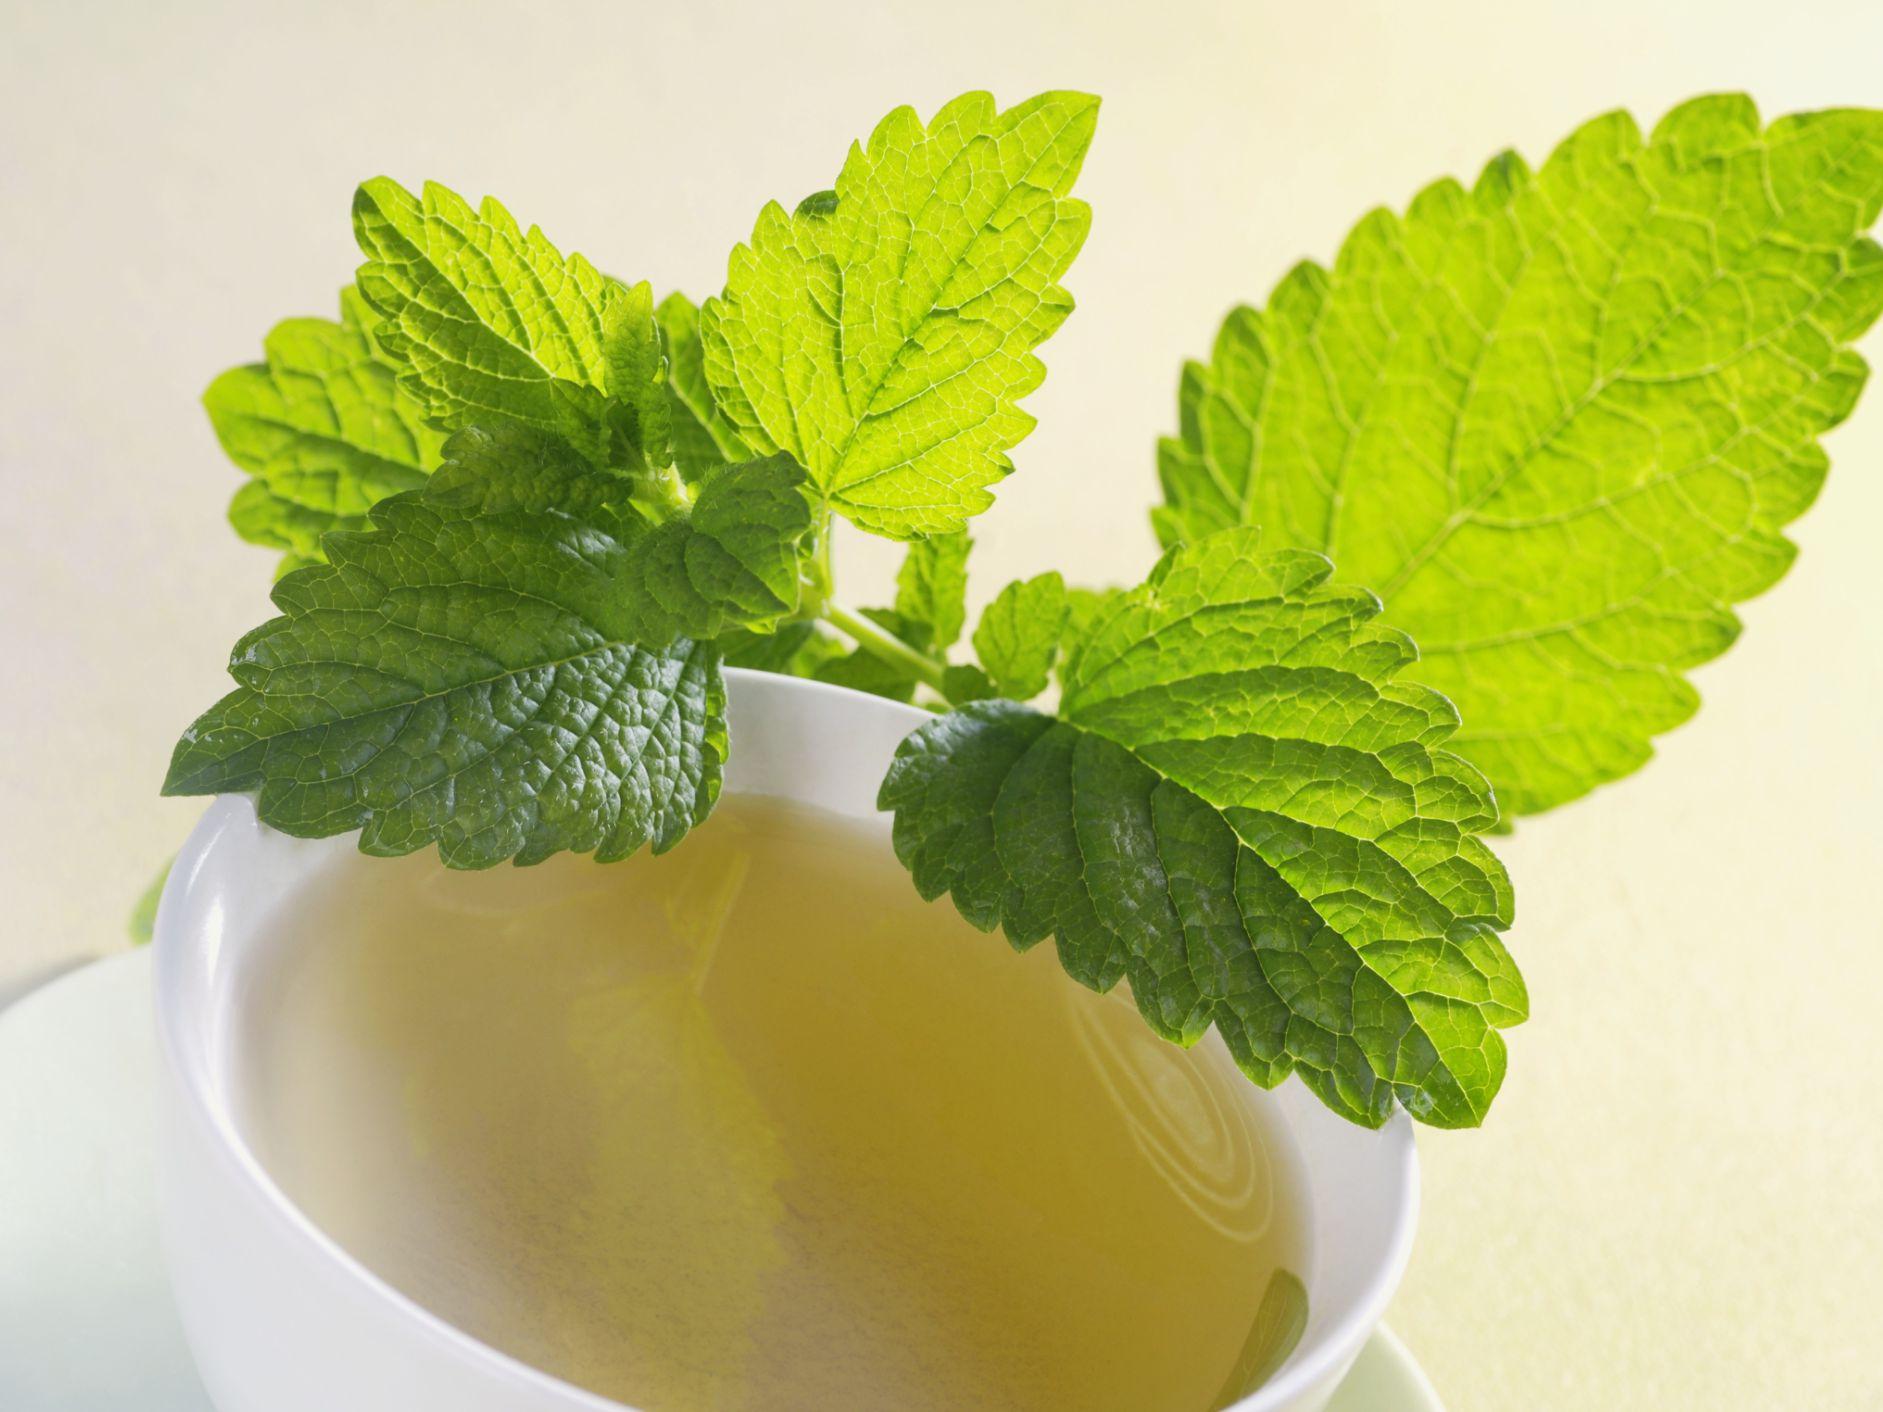 beneficios de la planta medicinal toronjil